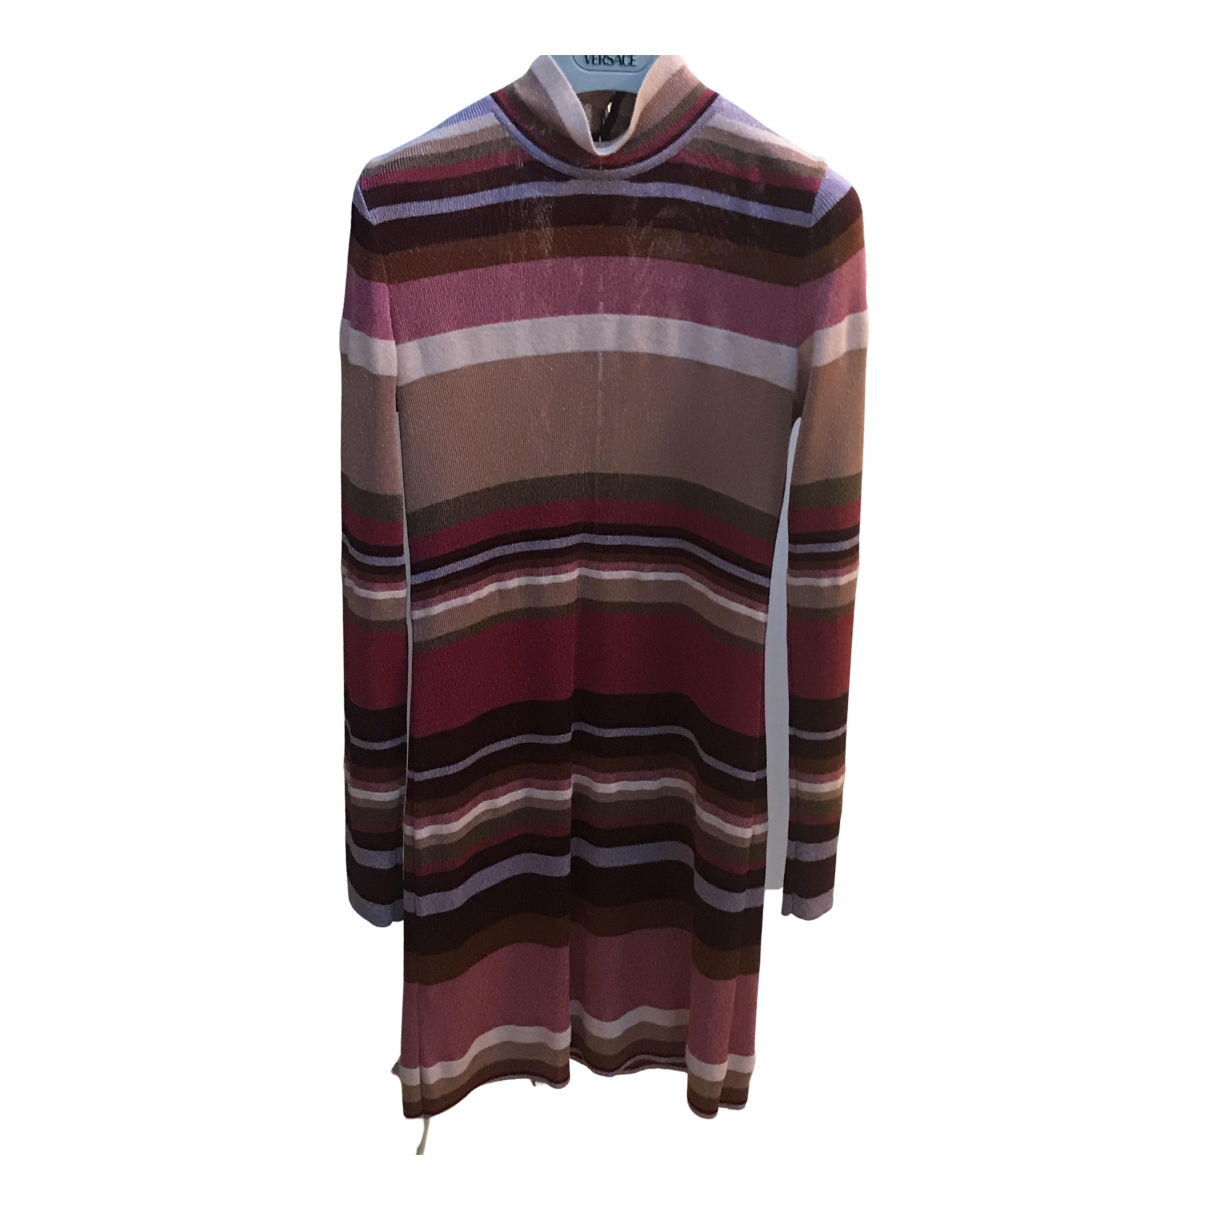 D&g \N Multicolour dress for Women 36 IT